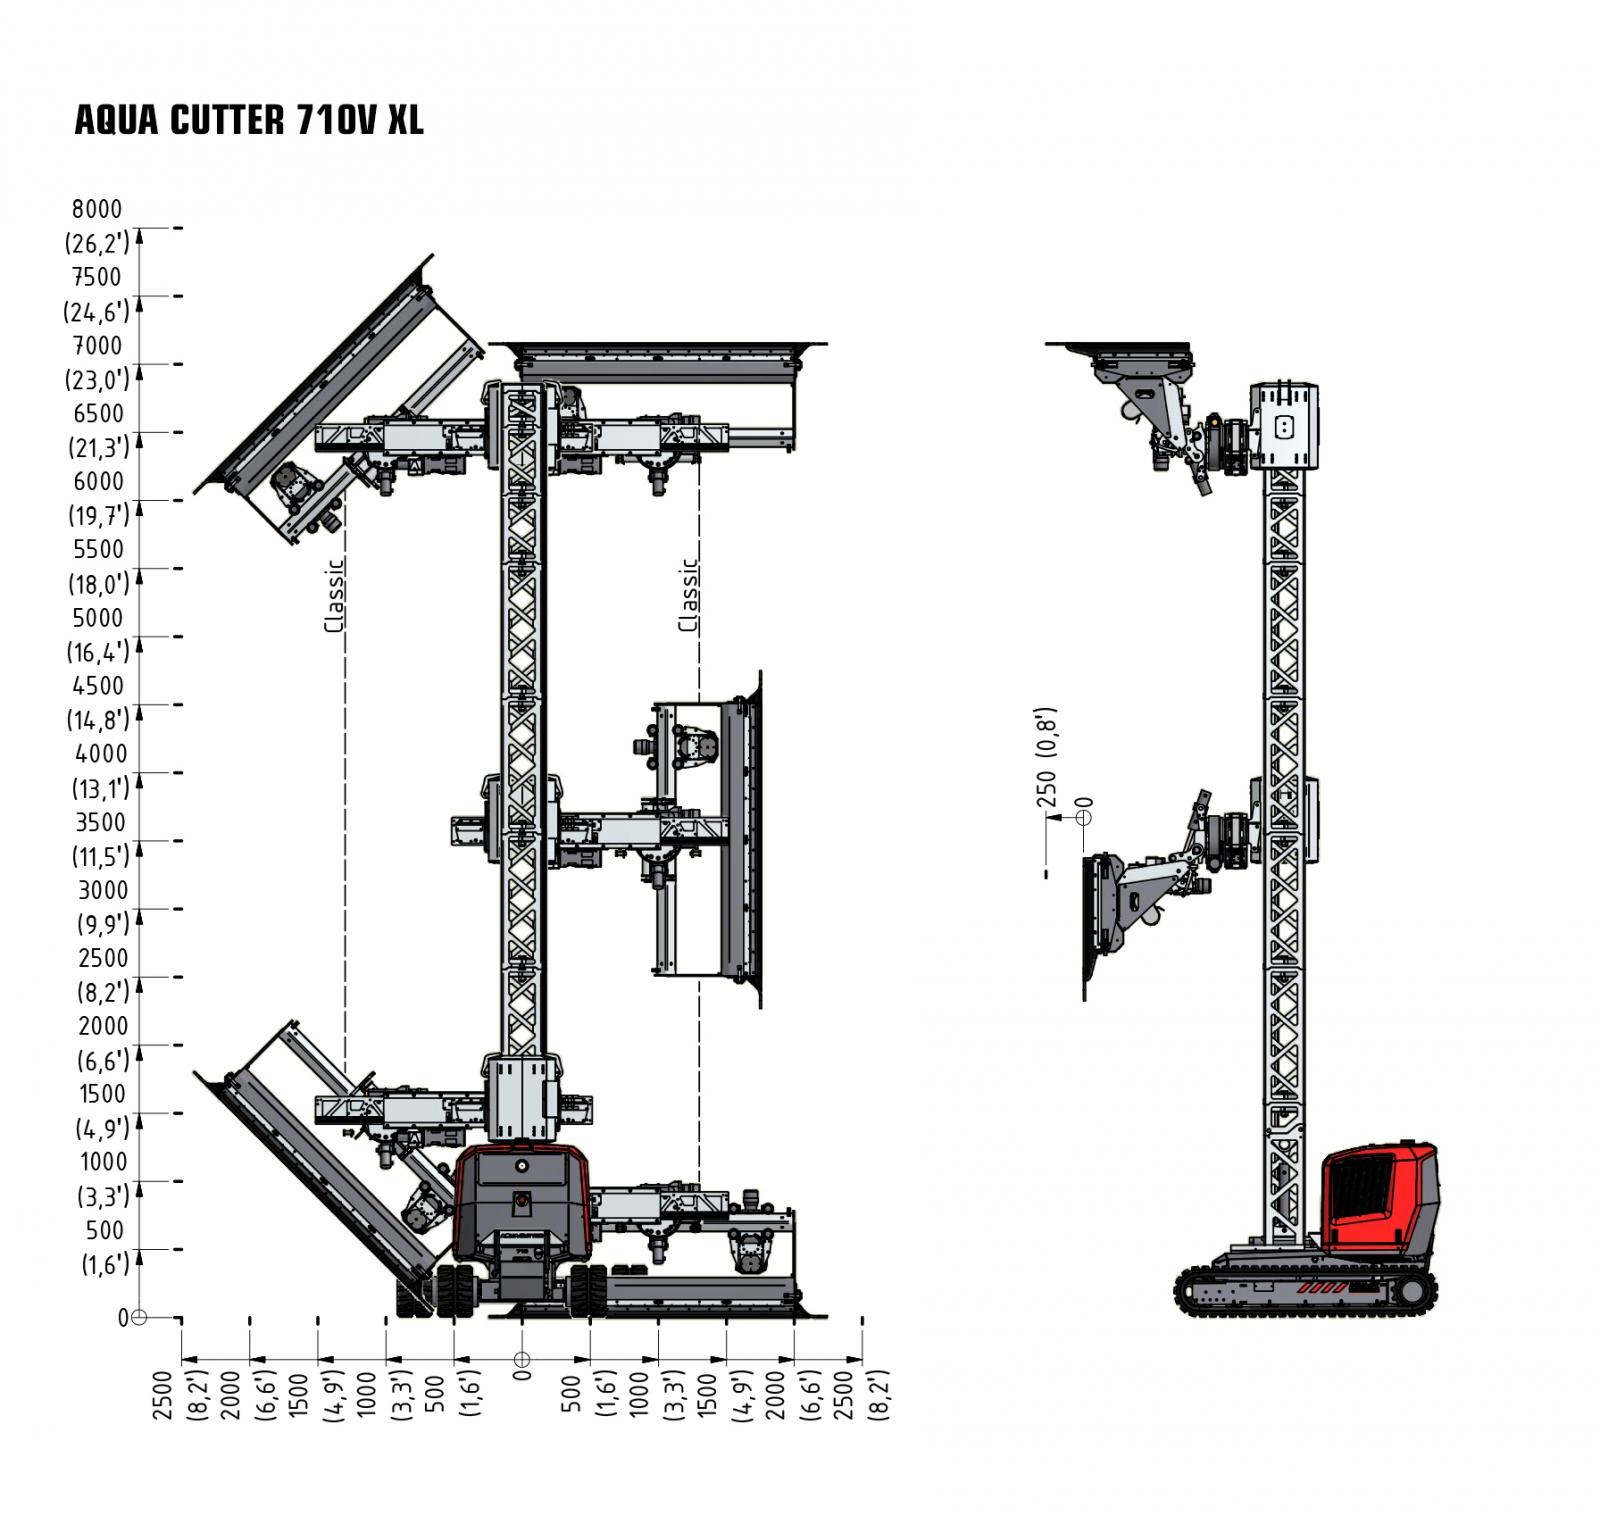 Aqua Cutter 710V XL Hydrodemolition Robot specifications